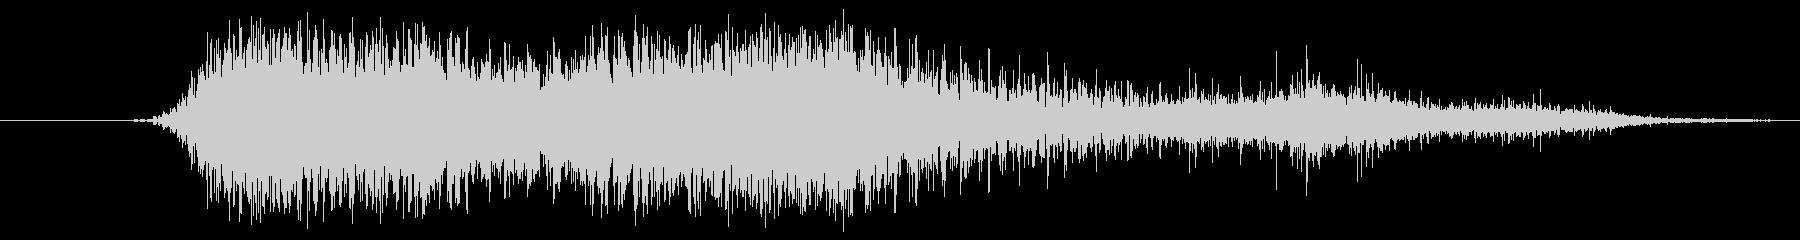 Raspy Growl 6の未再生の波形